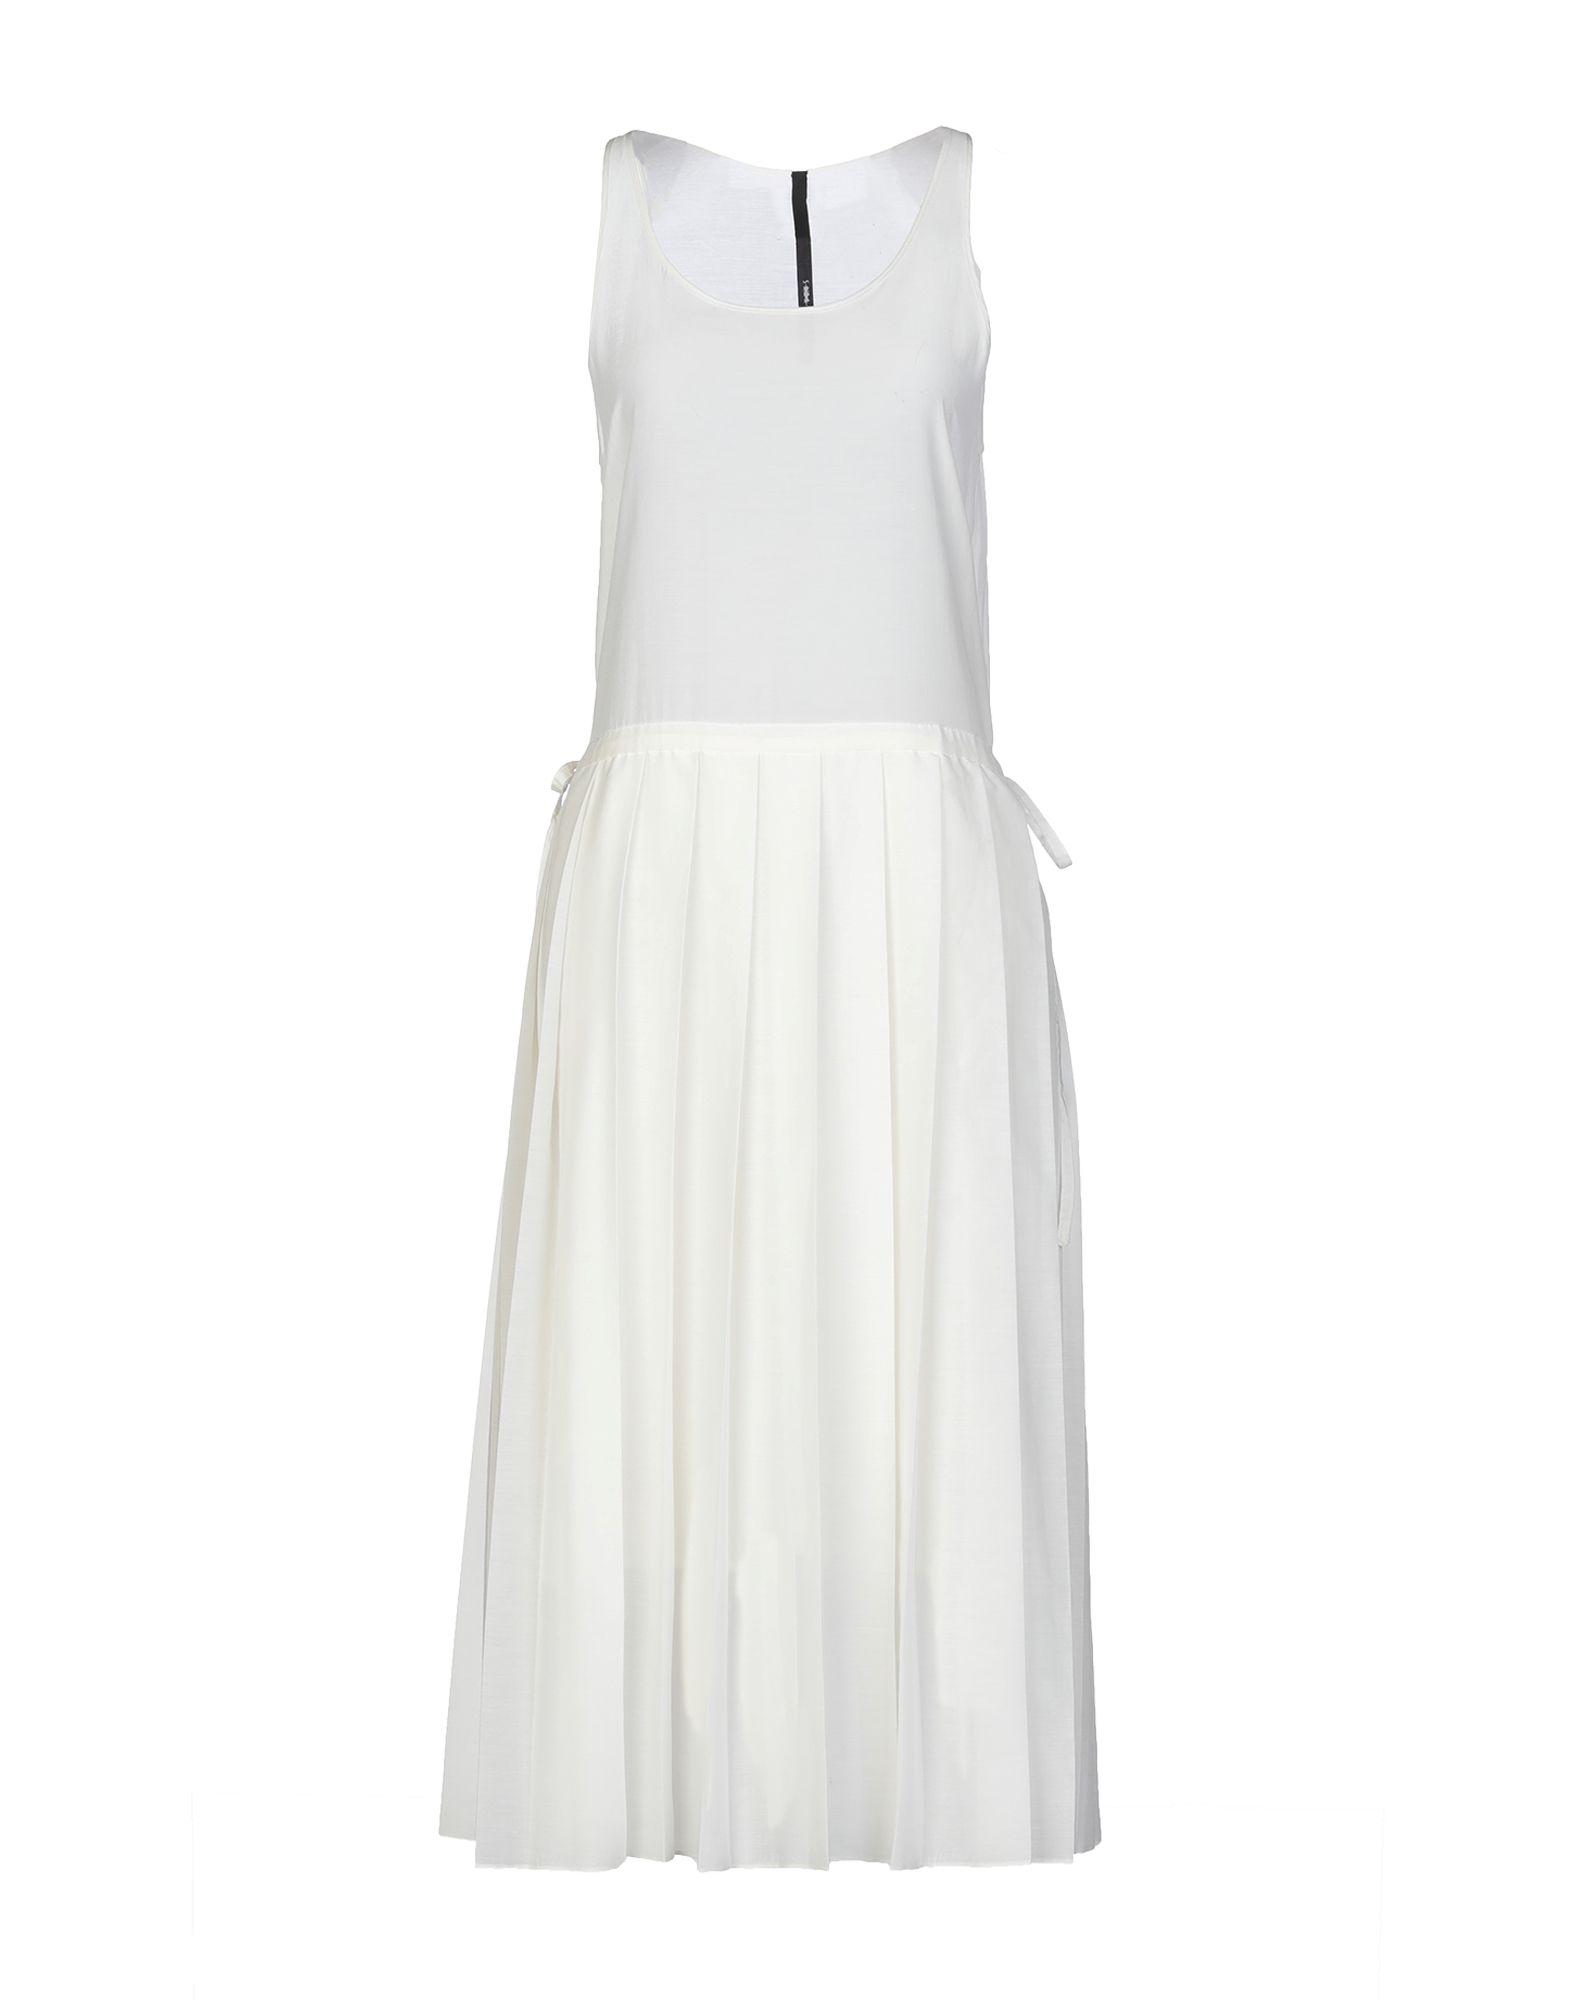 SARA LANZI Платье длиной 3/4 sara lanzi юбка длиной 3 4